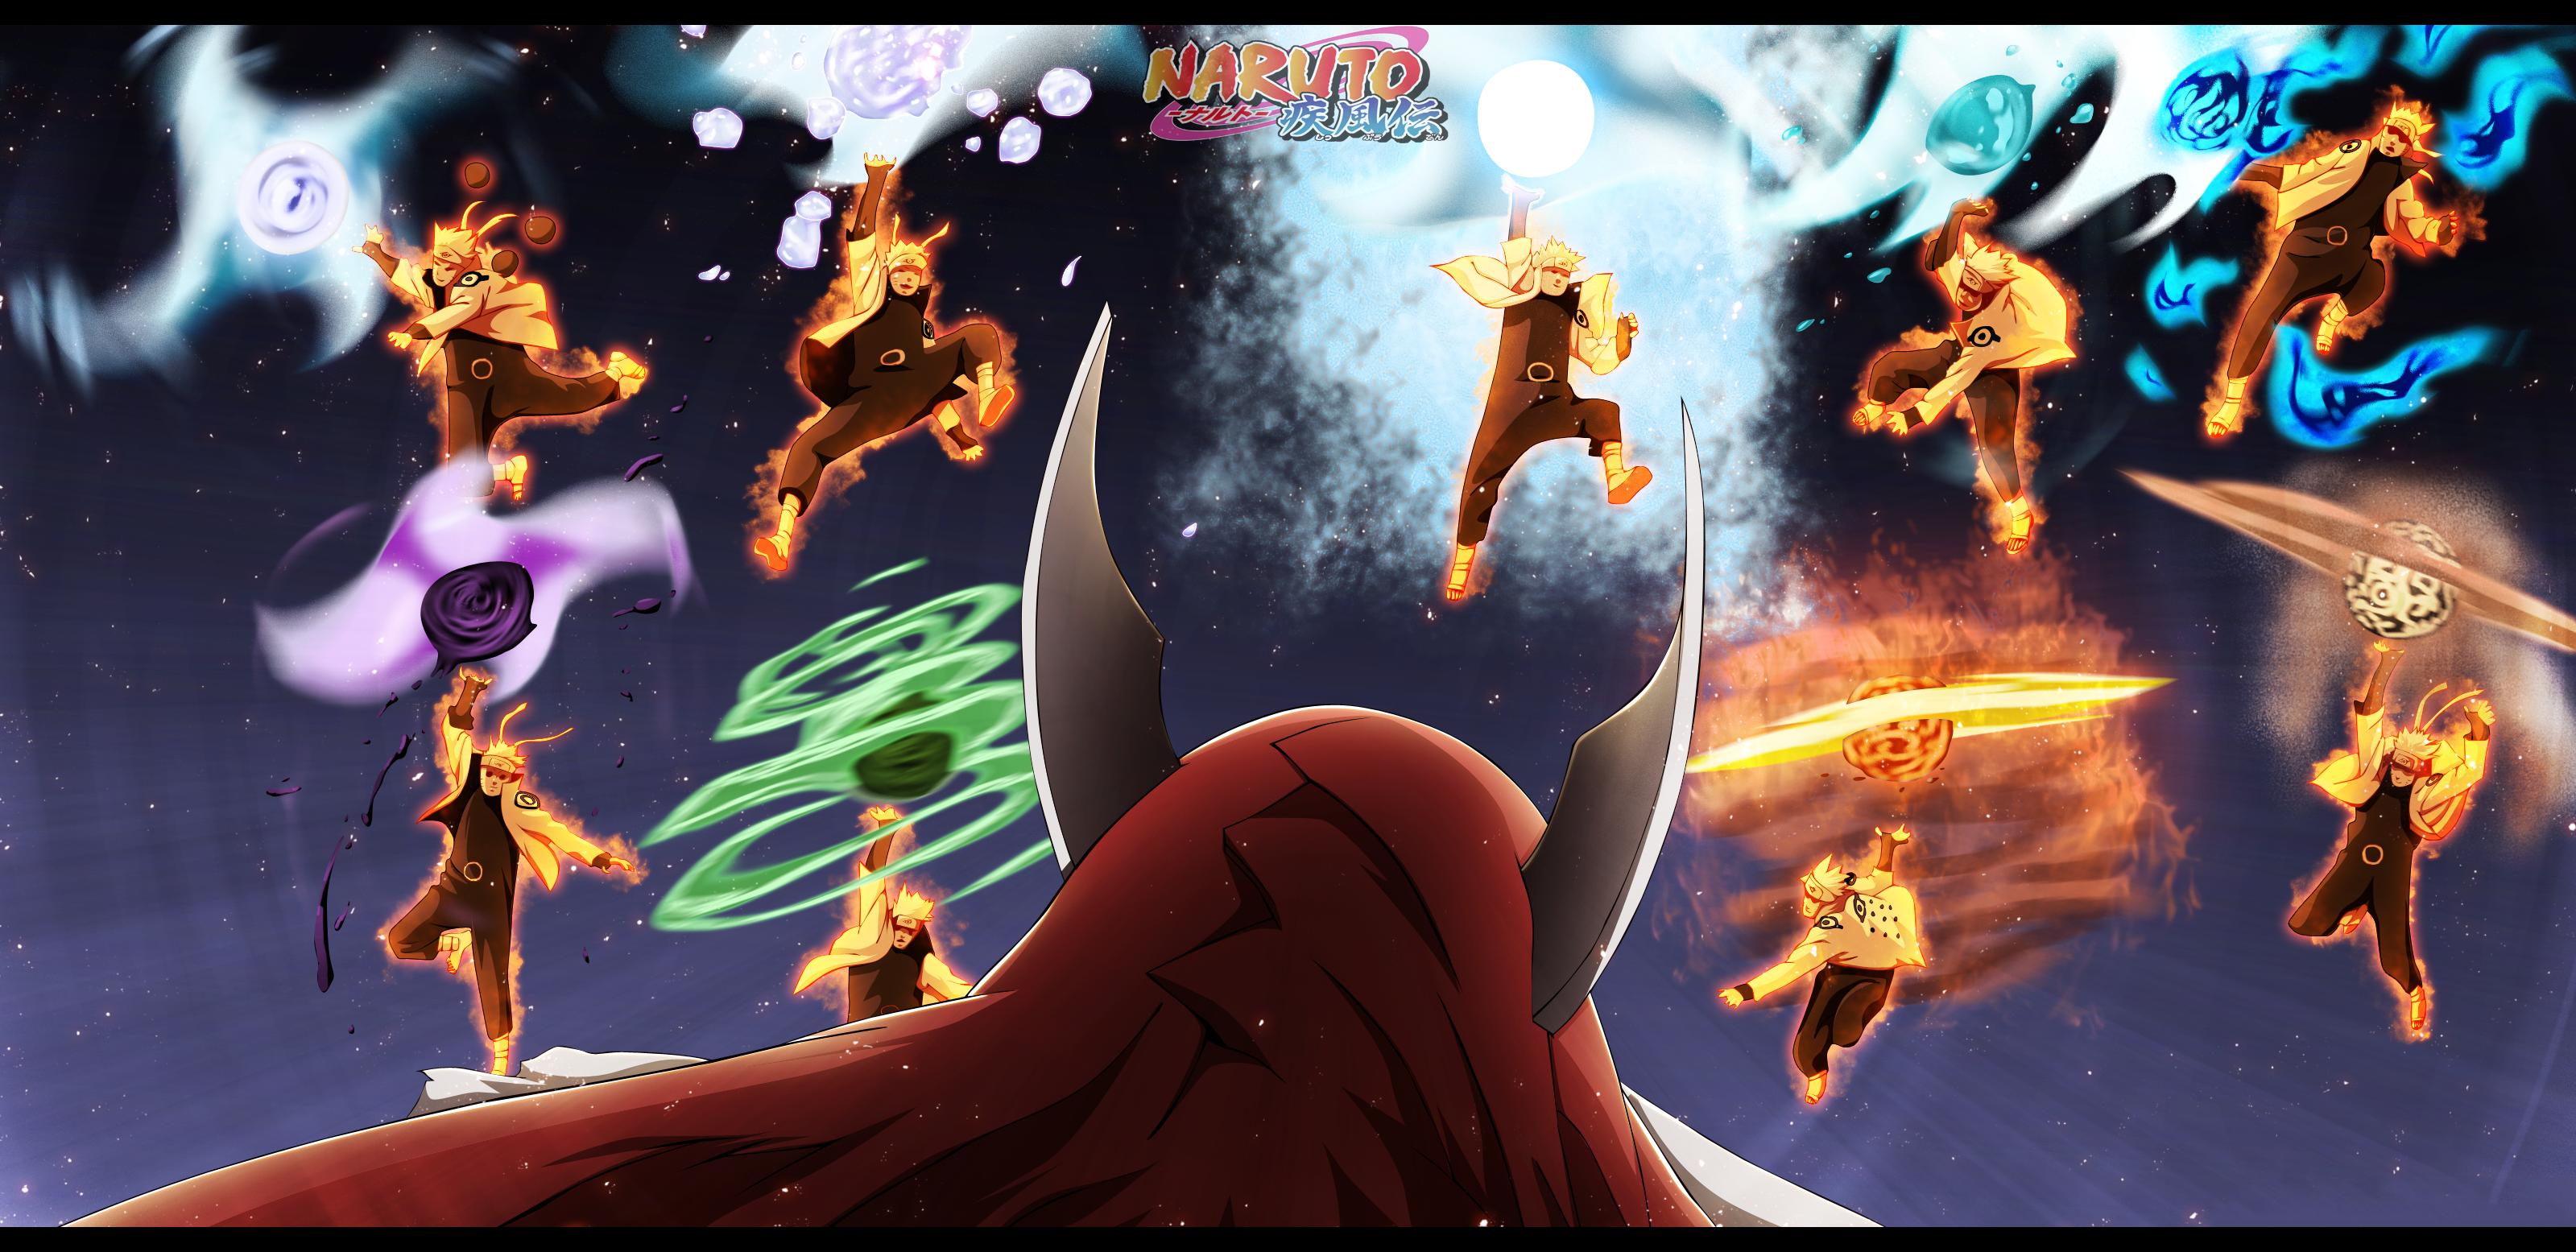 Naruto Vs Son Goku Yonbi Full HD Wallpaper And Background Image